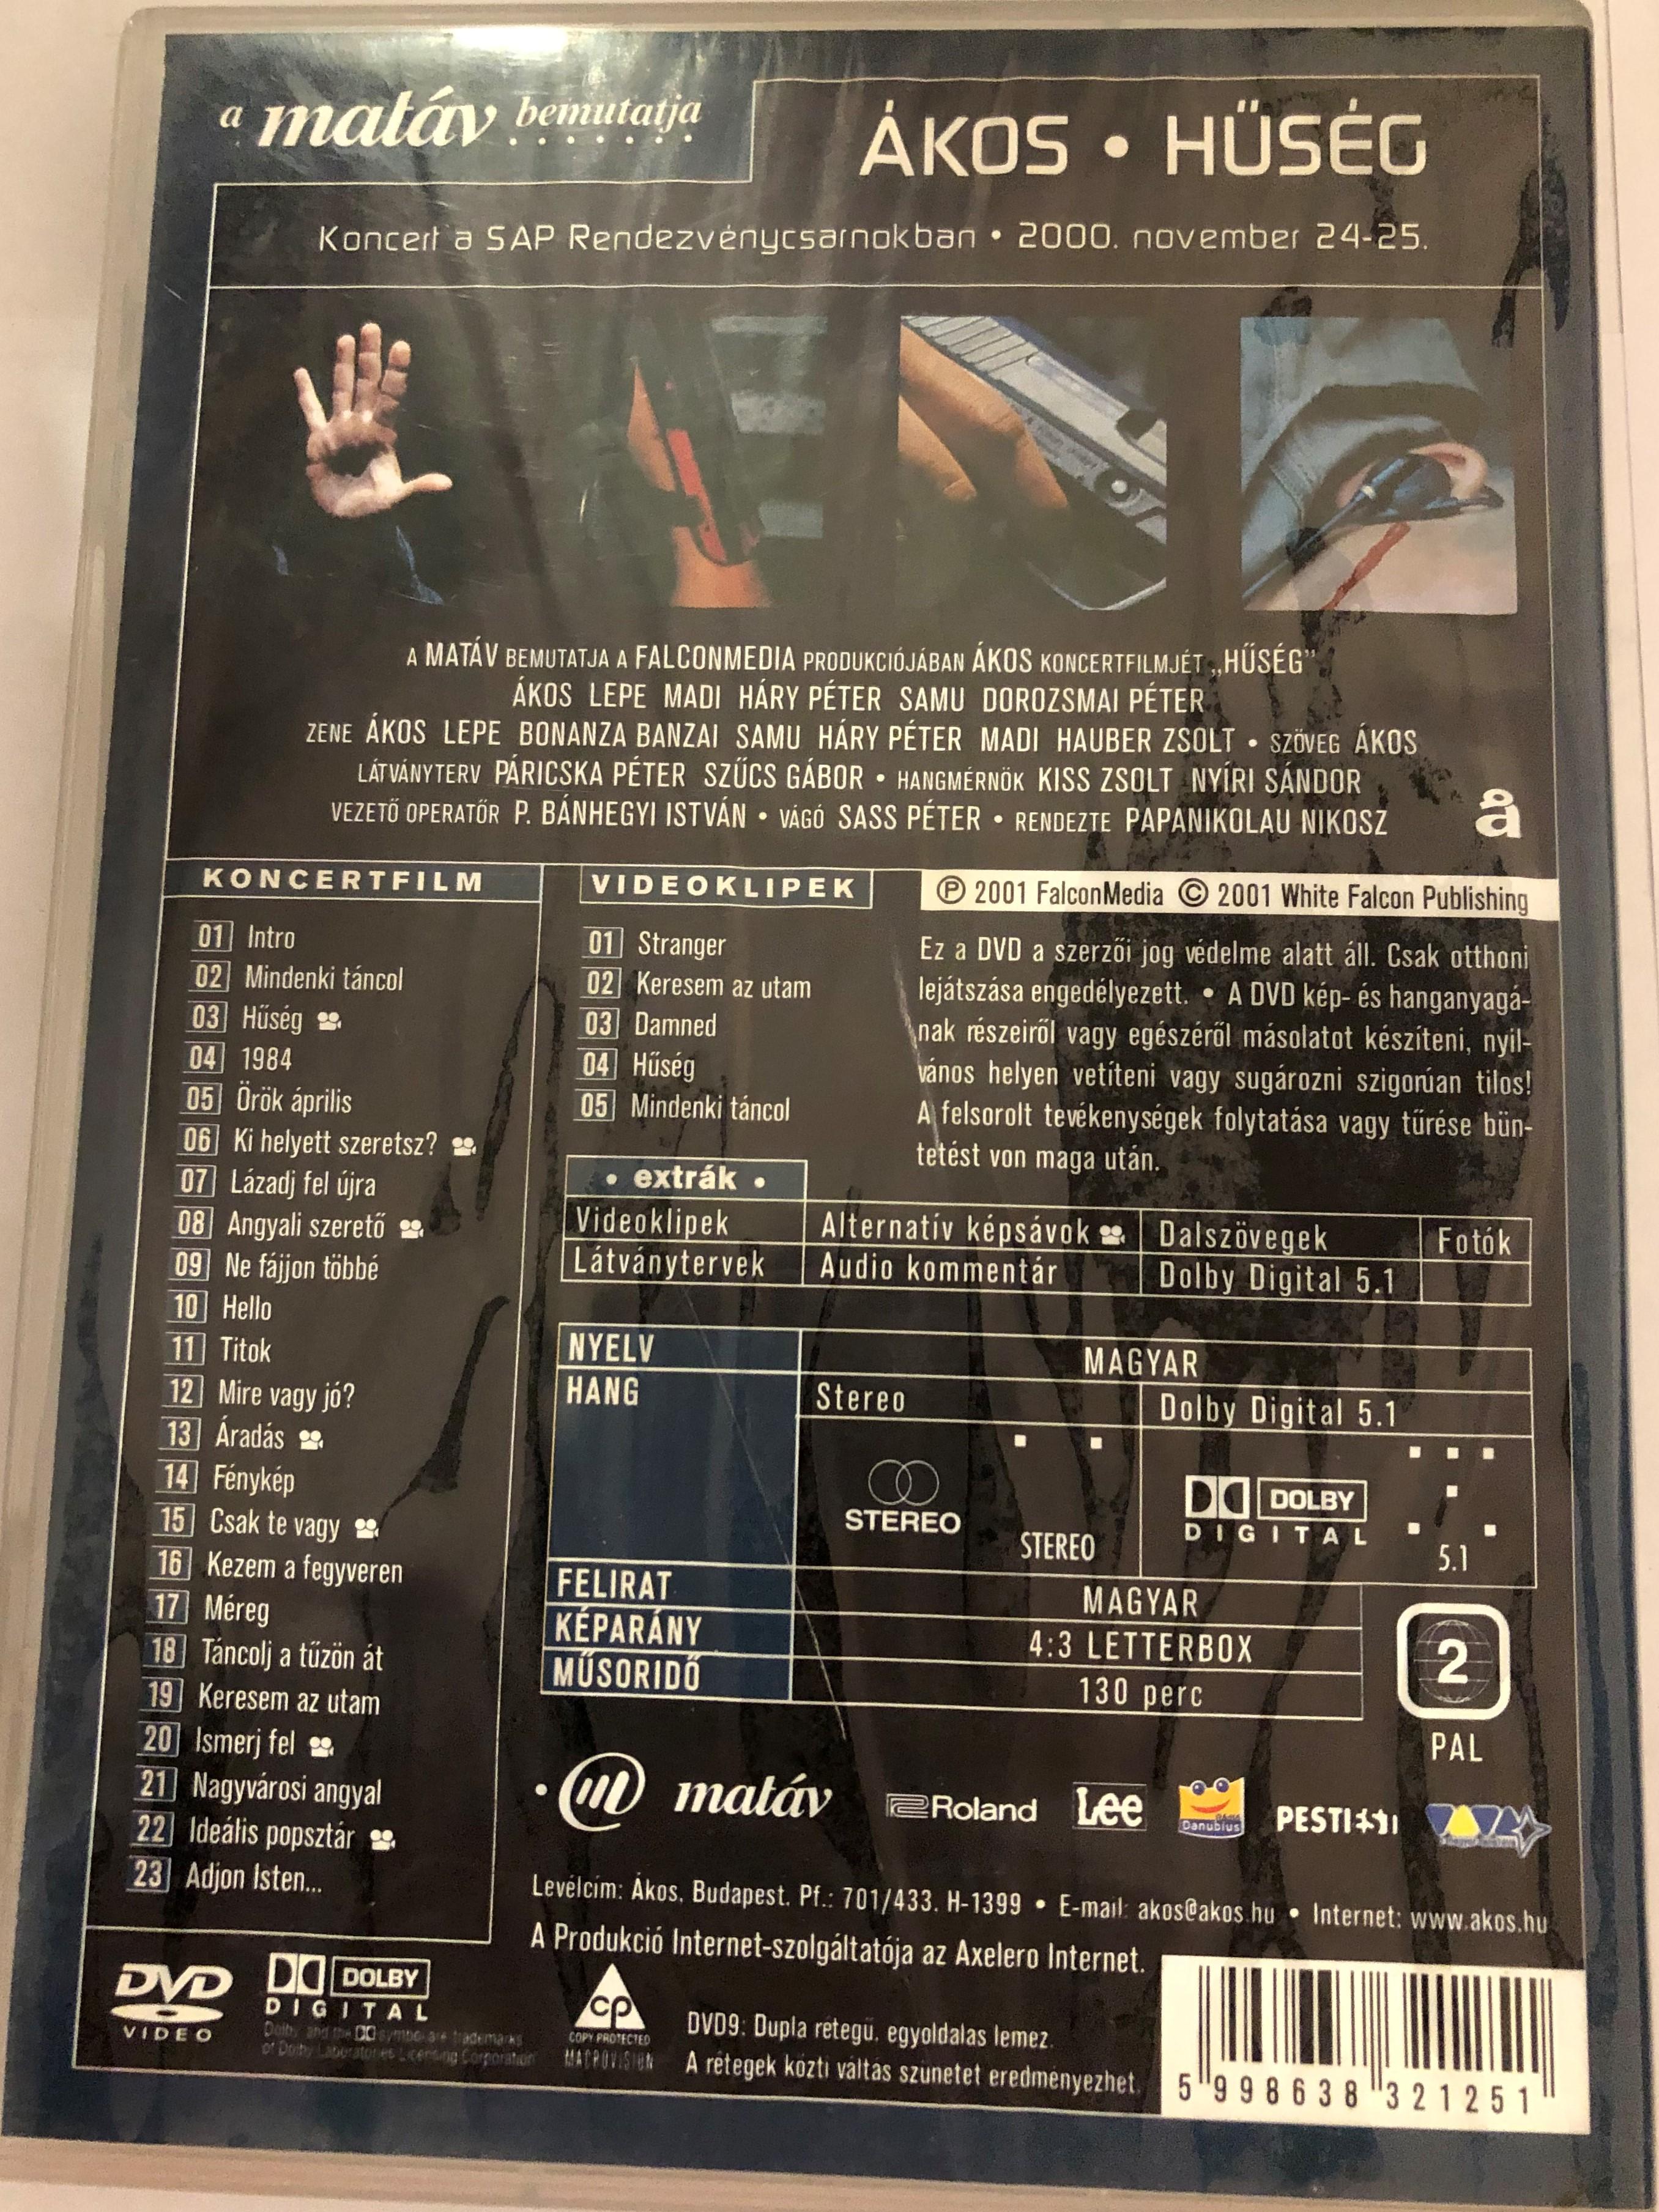 kos-h-s-g-dvd-2001-koncert-a-sap-rendezv-nycsarnokban-2000.-november-24-25.-2.jpg